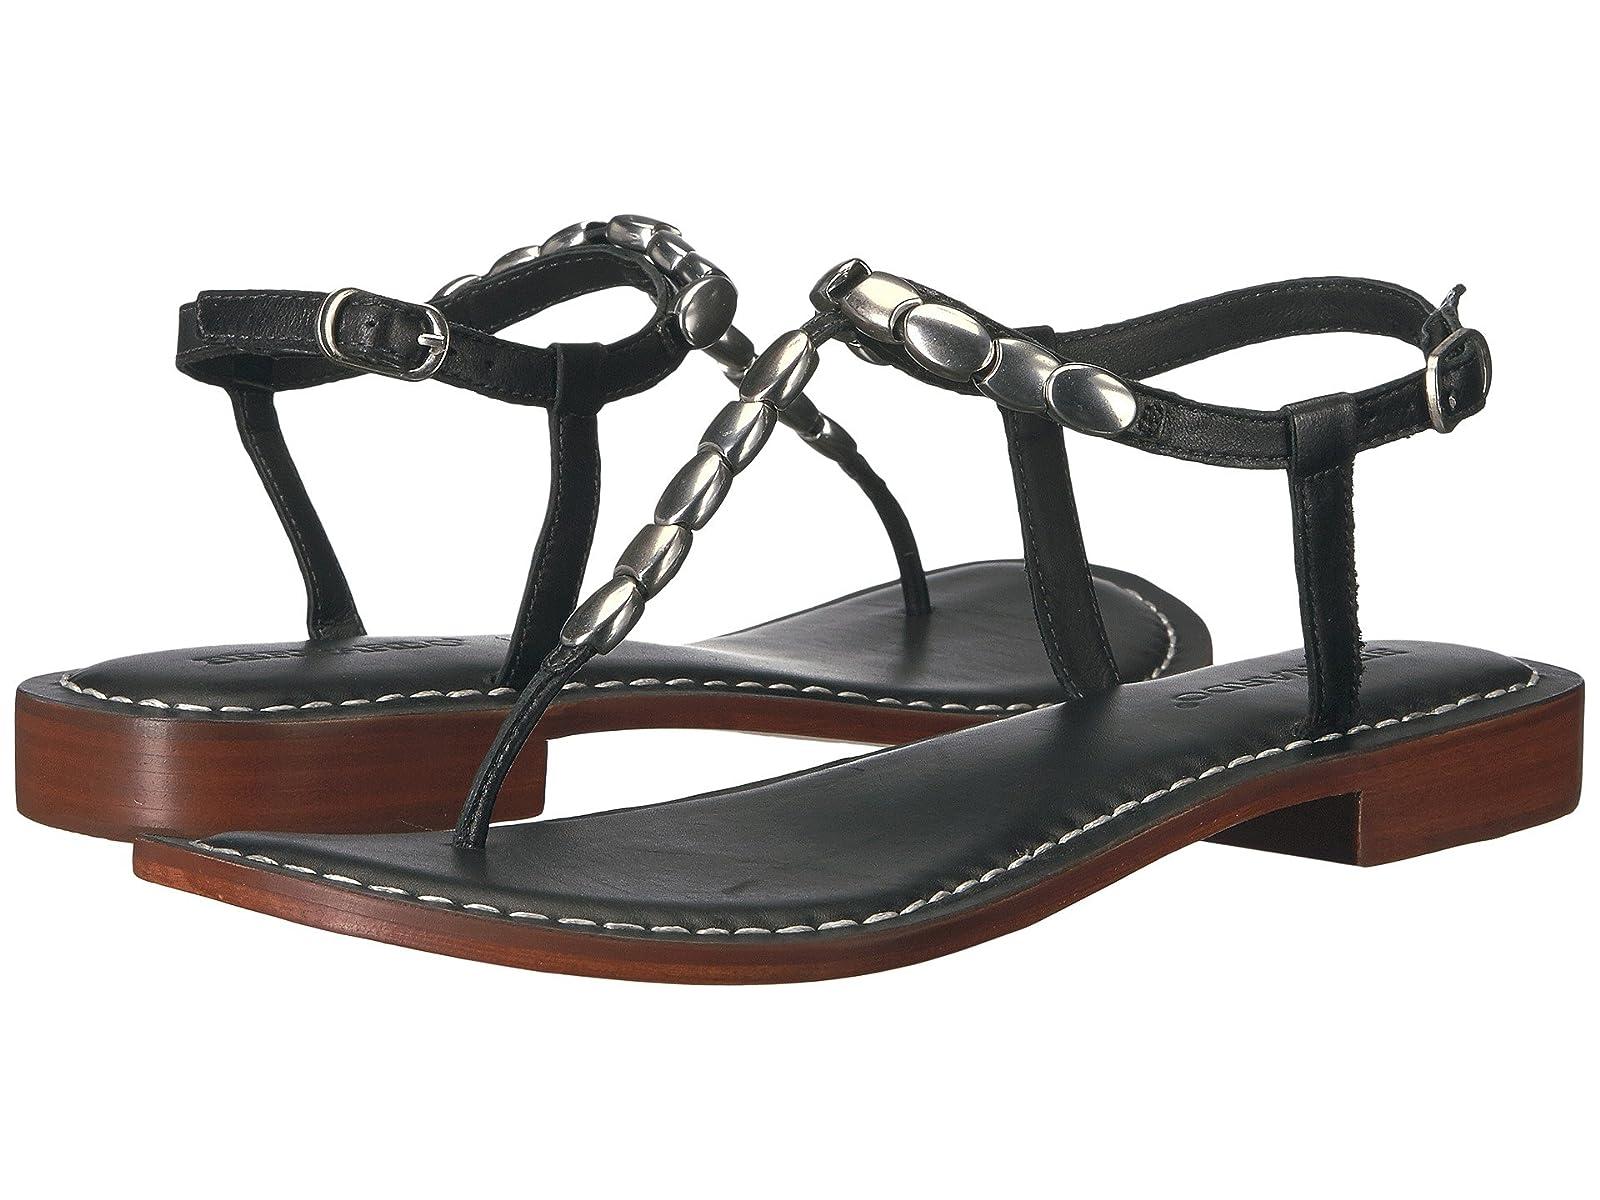 Bernardo TristanCheap and distinctive eye-catching shoes